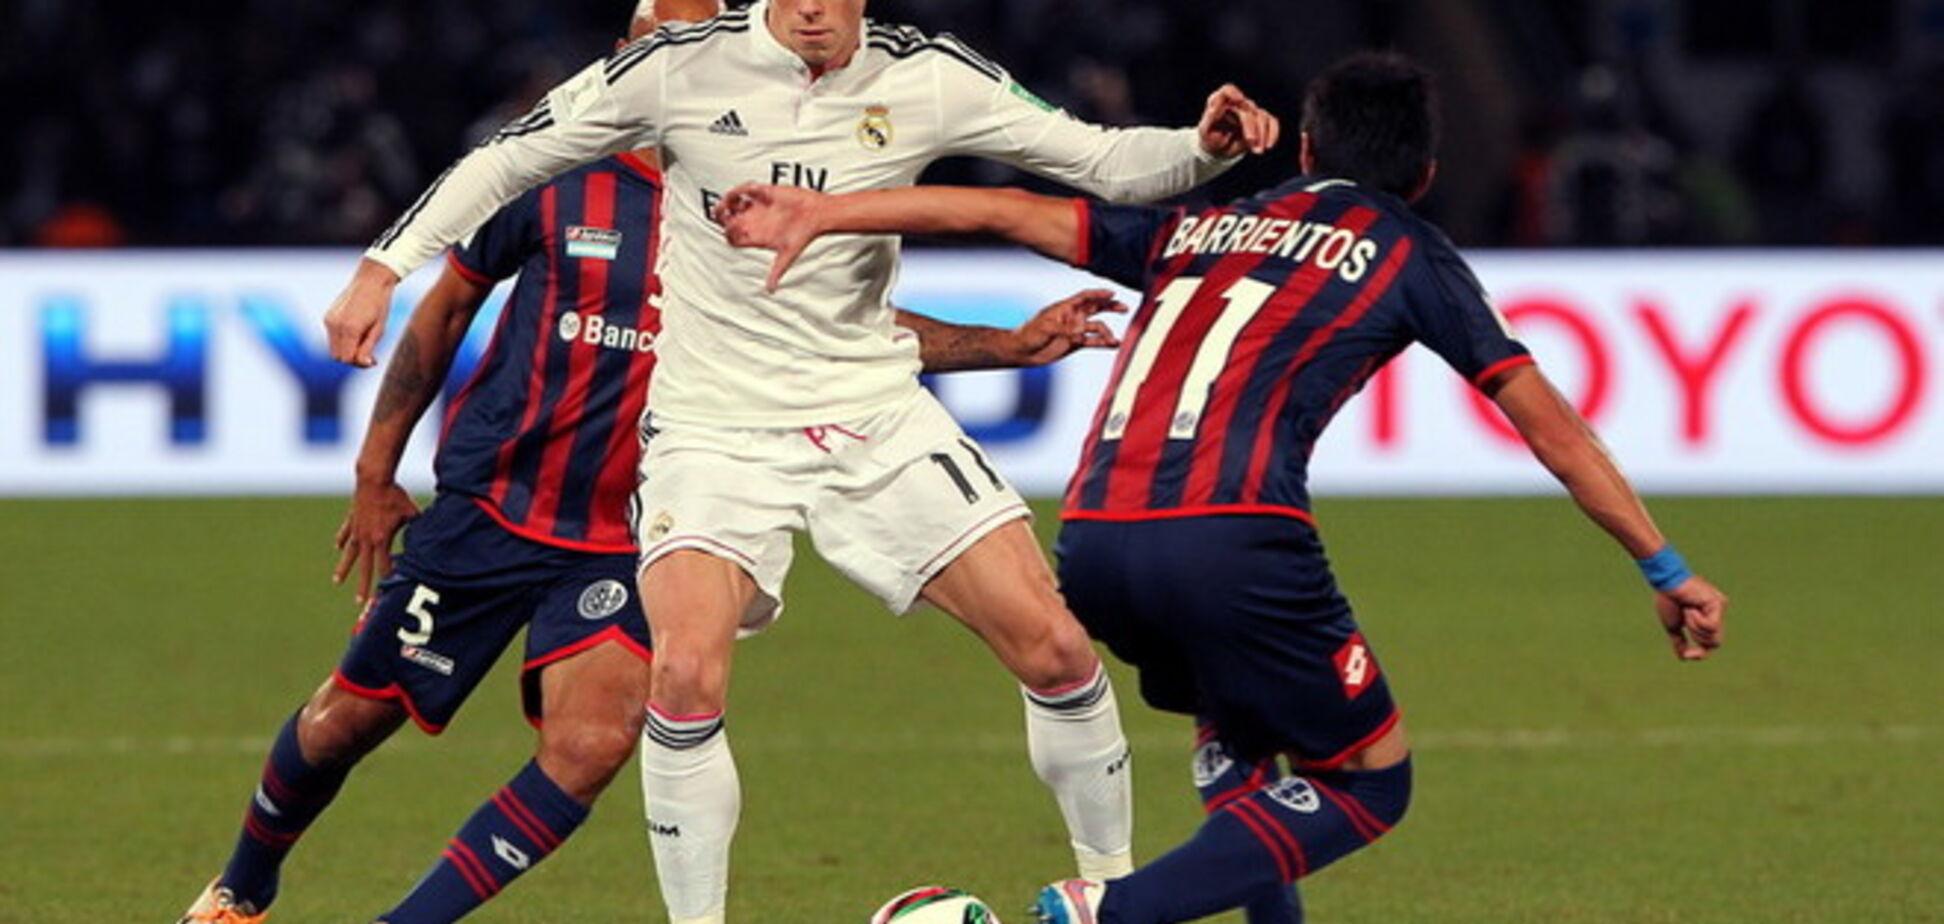 Реал – Сан-Лоренцо– 2-0: видео-обзор матча